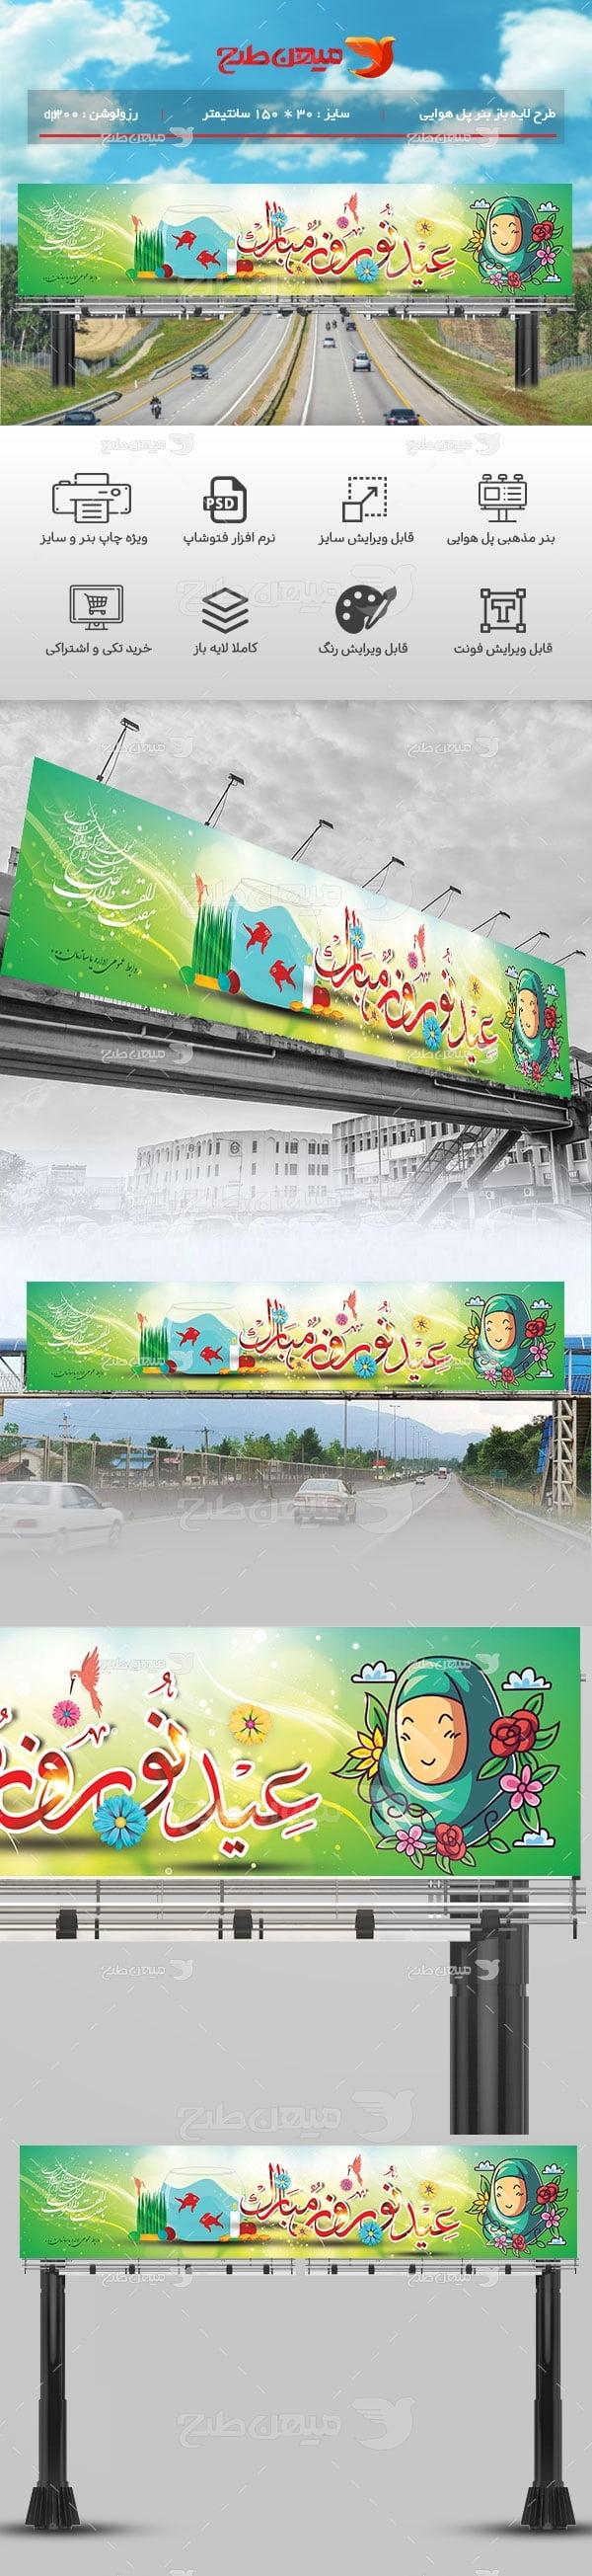 طرح لایه باز بنر پل هوایی عید نوروز